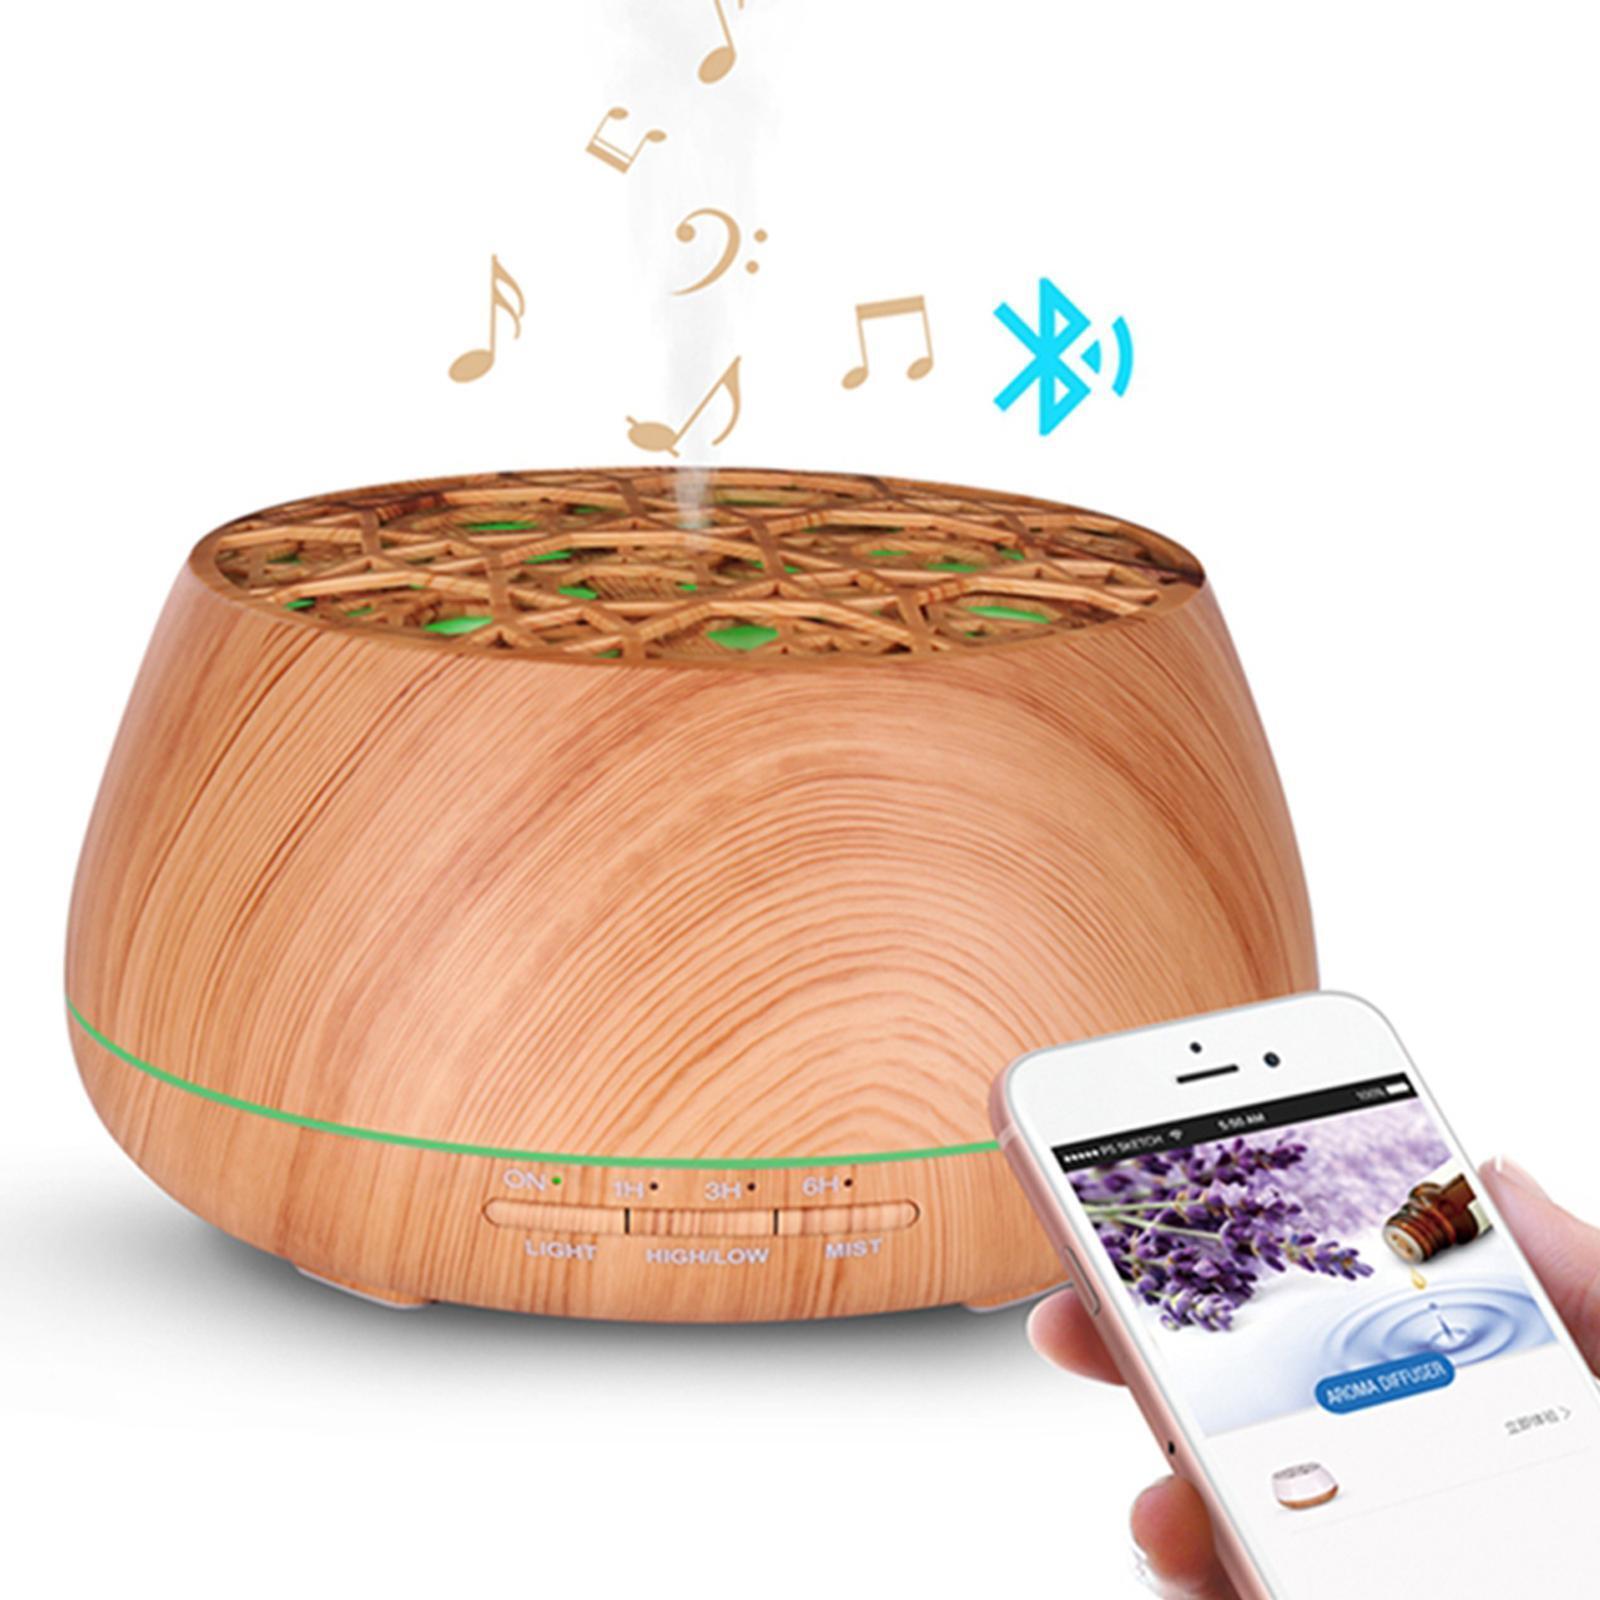 TODO 400ml Humidifier Aromatherapy Diffuser Bluetooth Speaker + APP